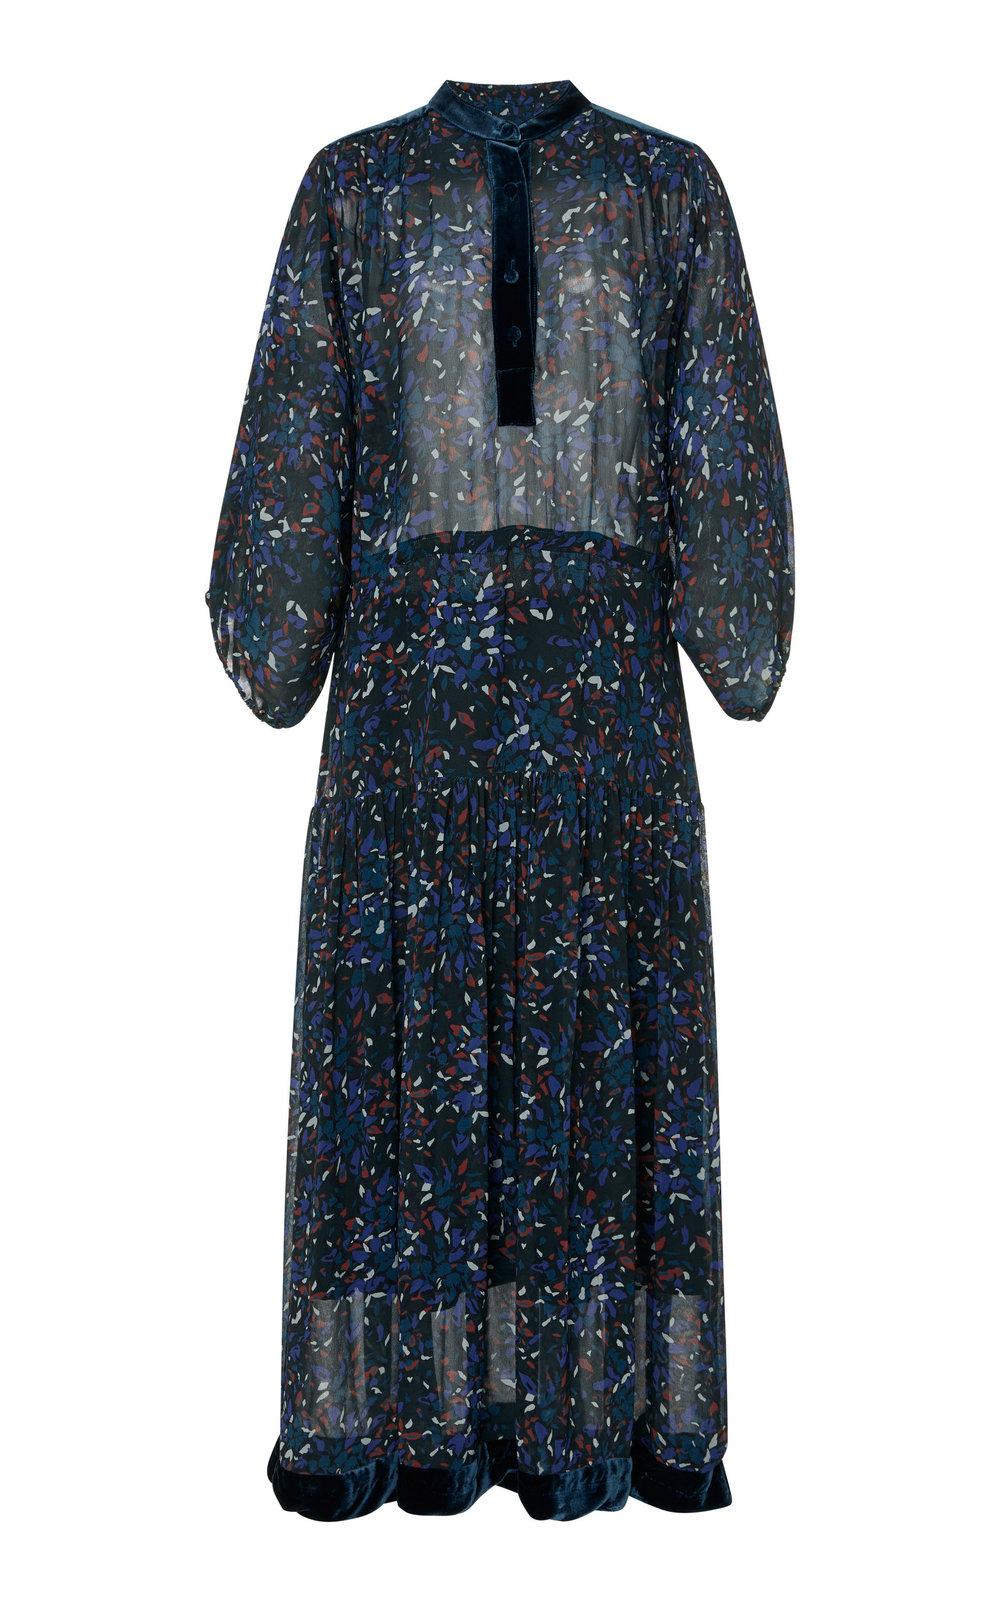 Primrose Velvet-Trimmed Printed Chiffon Maxi Dress – Warm